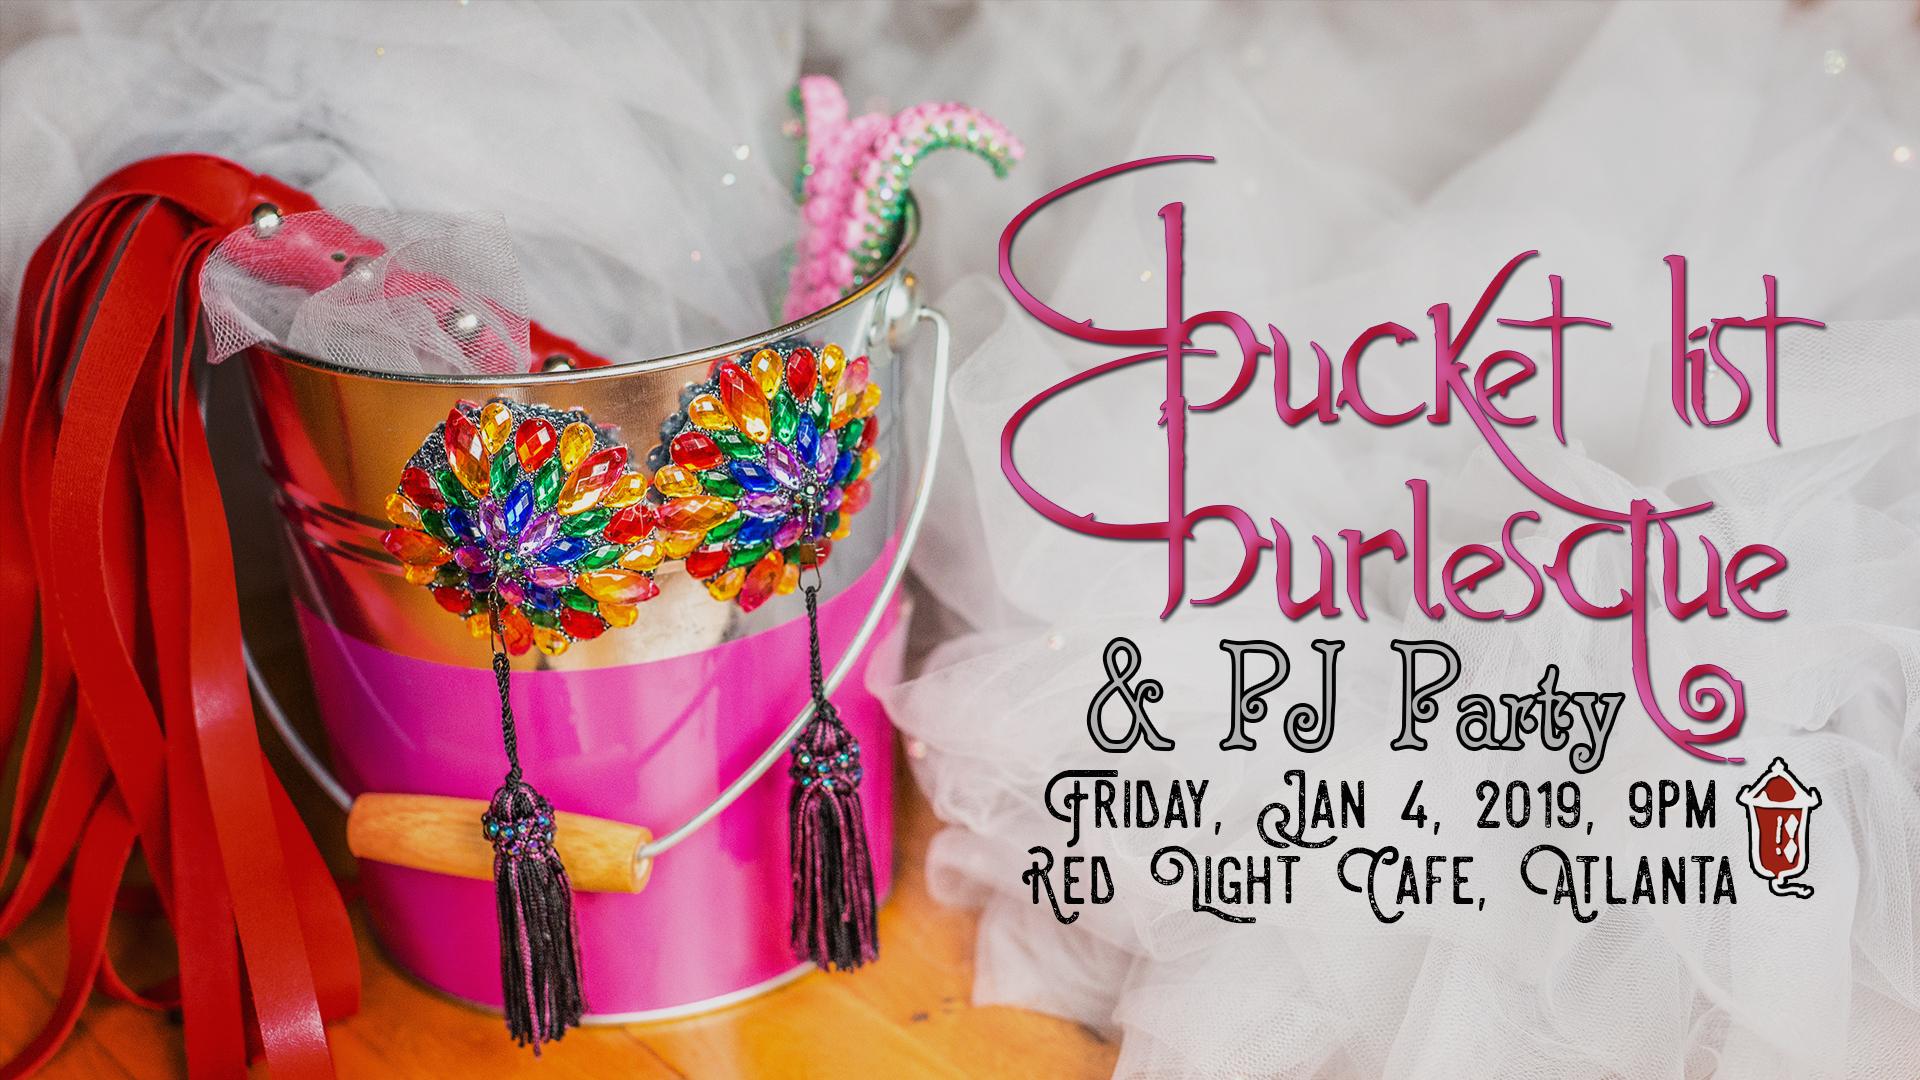 Bucket List Burlesque Show and Blanket Fort Party — January 4, 2019 — Red Light Café, Atlanta, GA